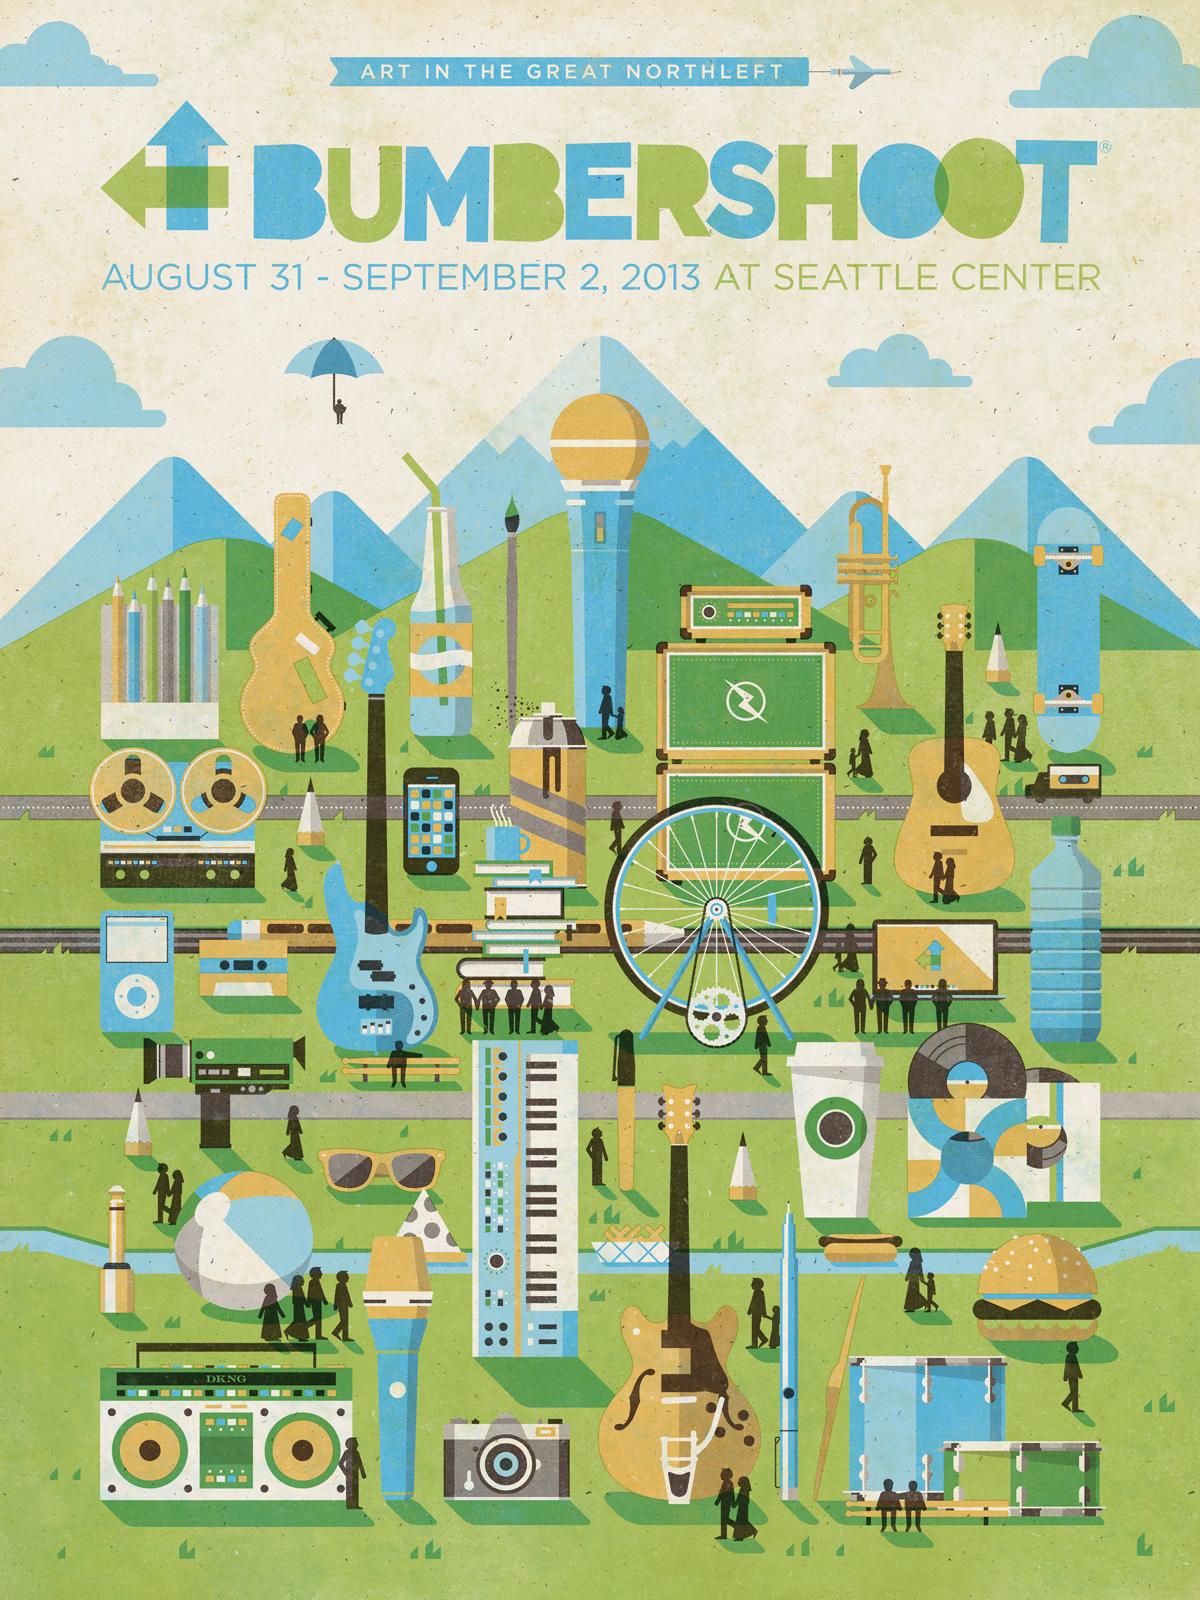 Bumbershoot Festival Branding by DKNG